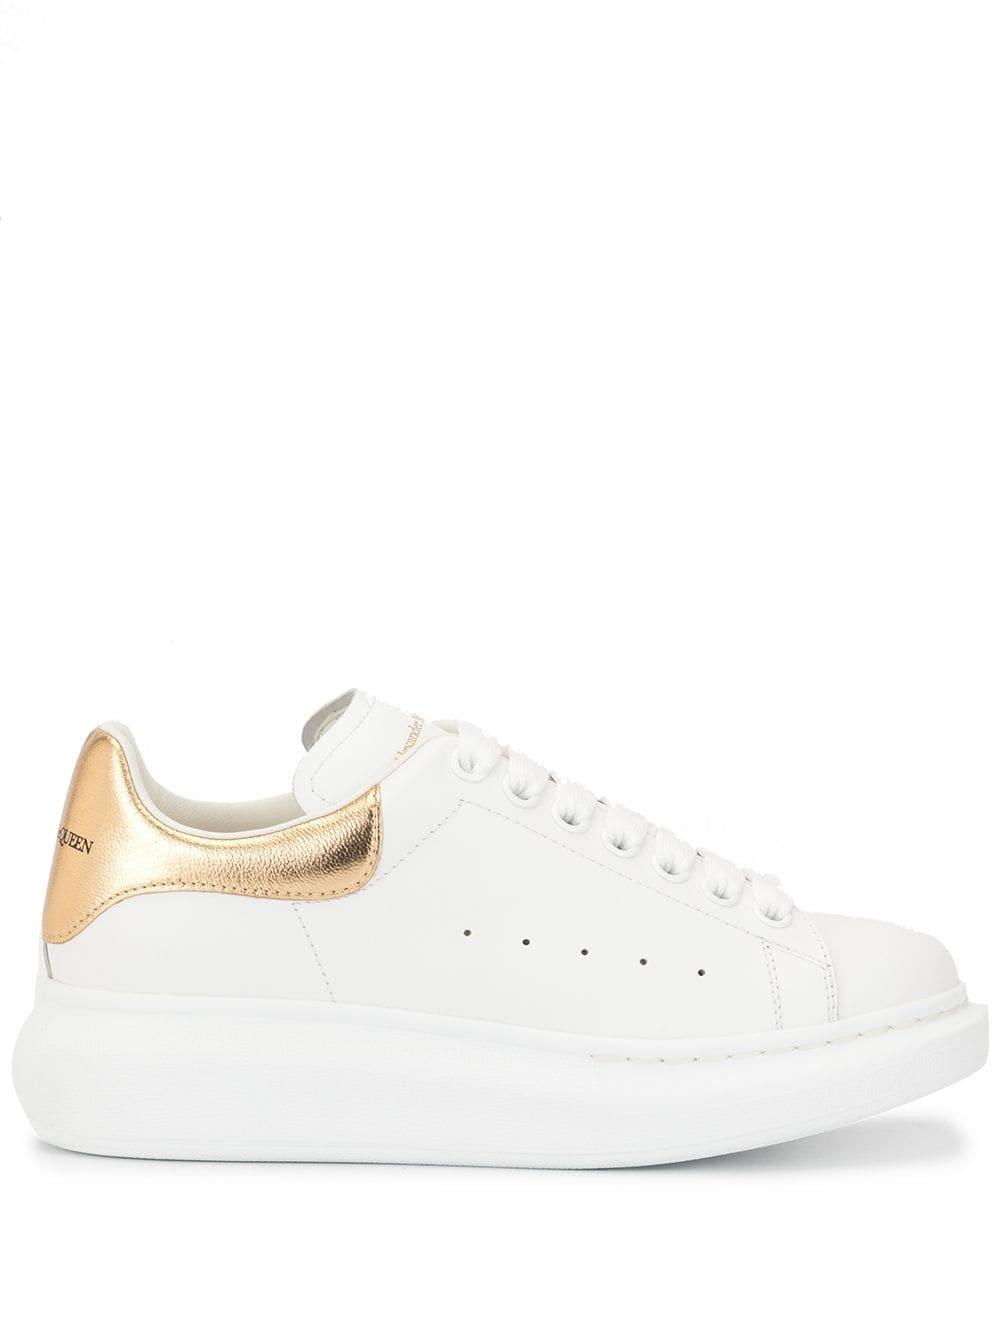 Alexander McQueen Chunky low-top Sneakers - Farfetch